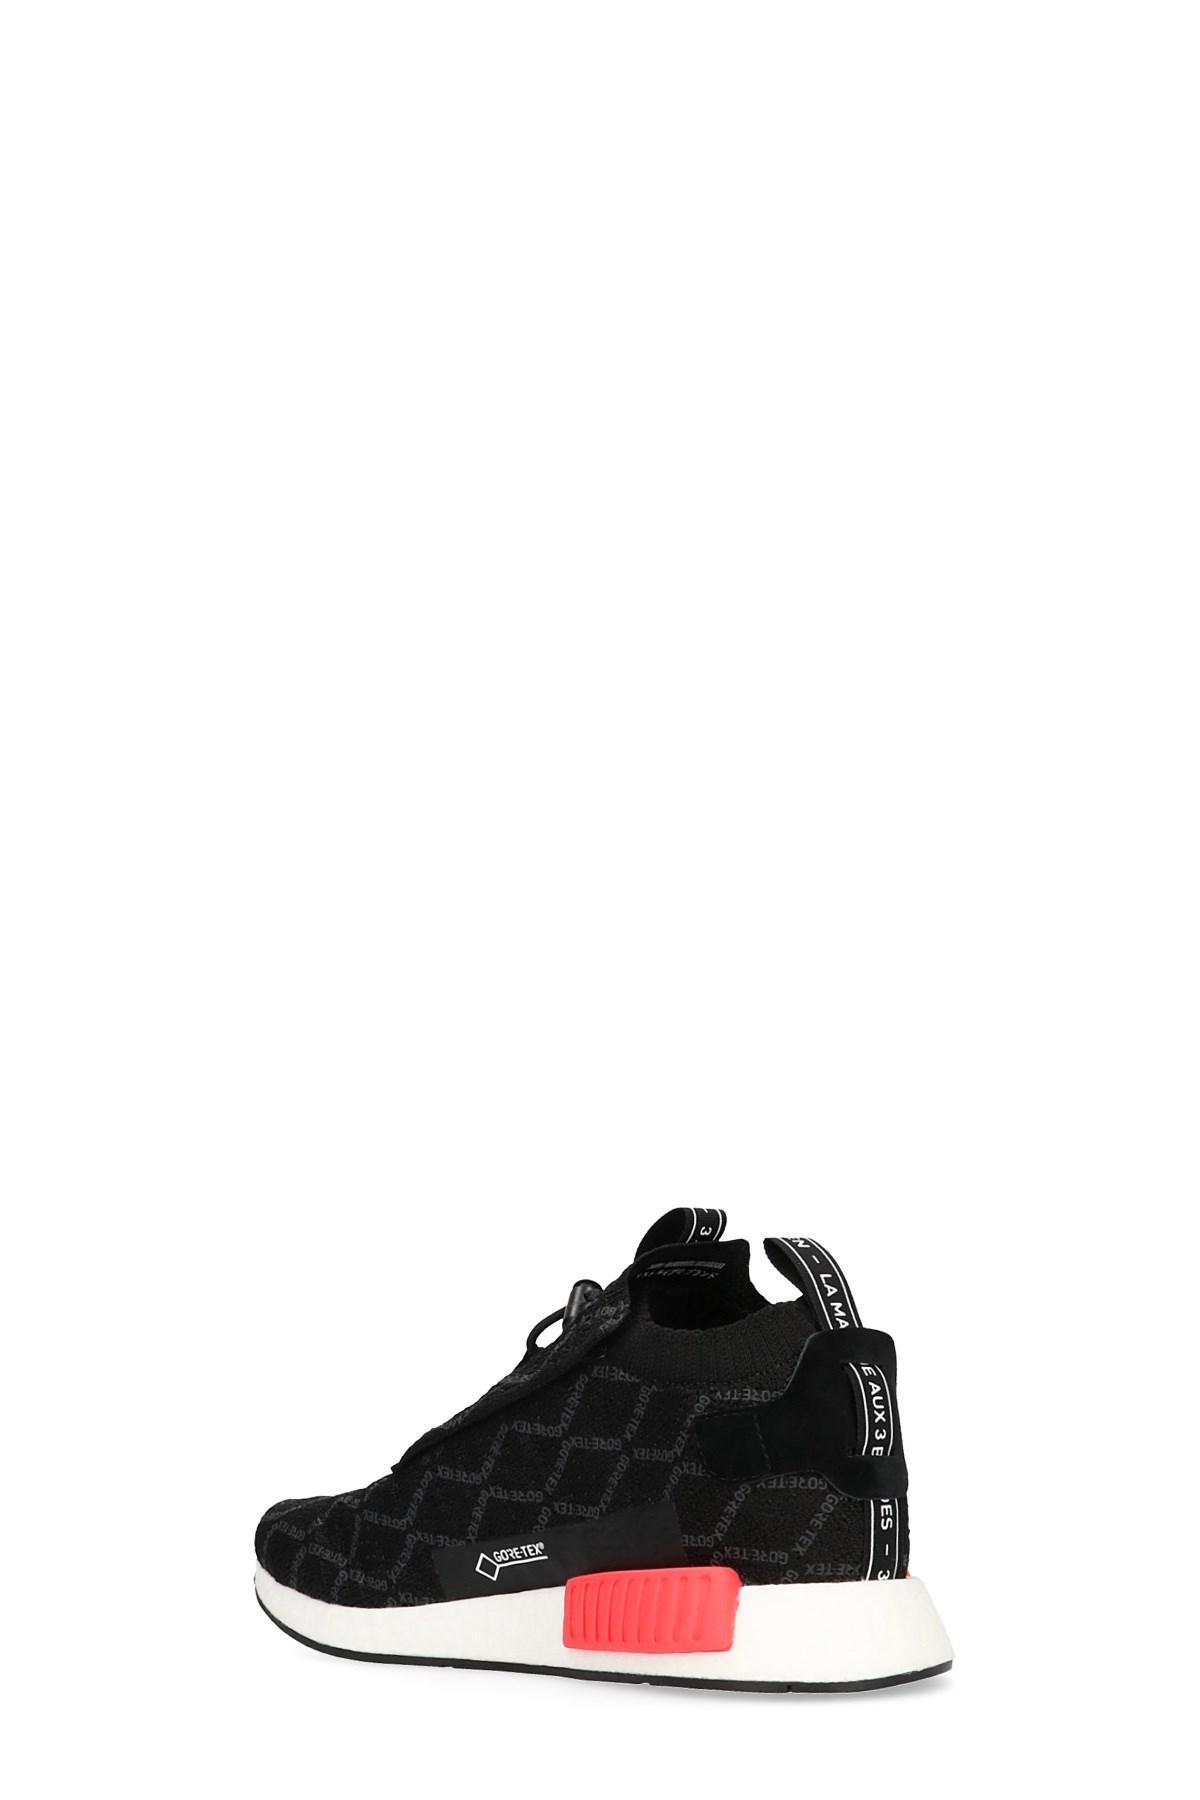 d23fd1773 for Originals Lyst  nmd fullscreen Black Sneakers ts1 Adidas View Gtx  Pk  Men ngqwzHx0R